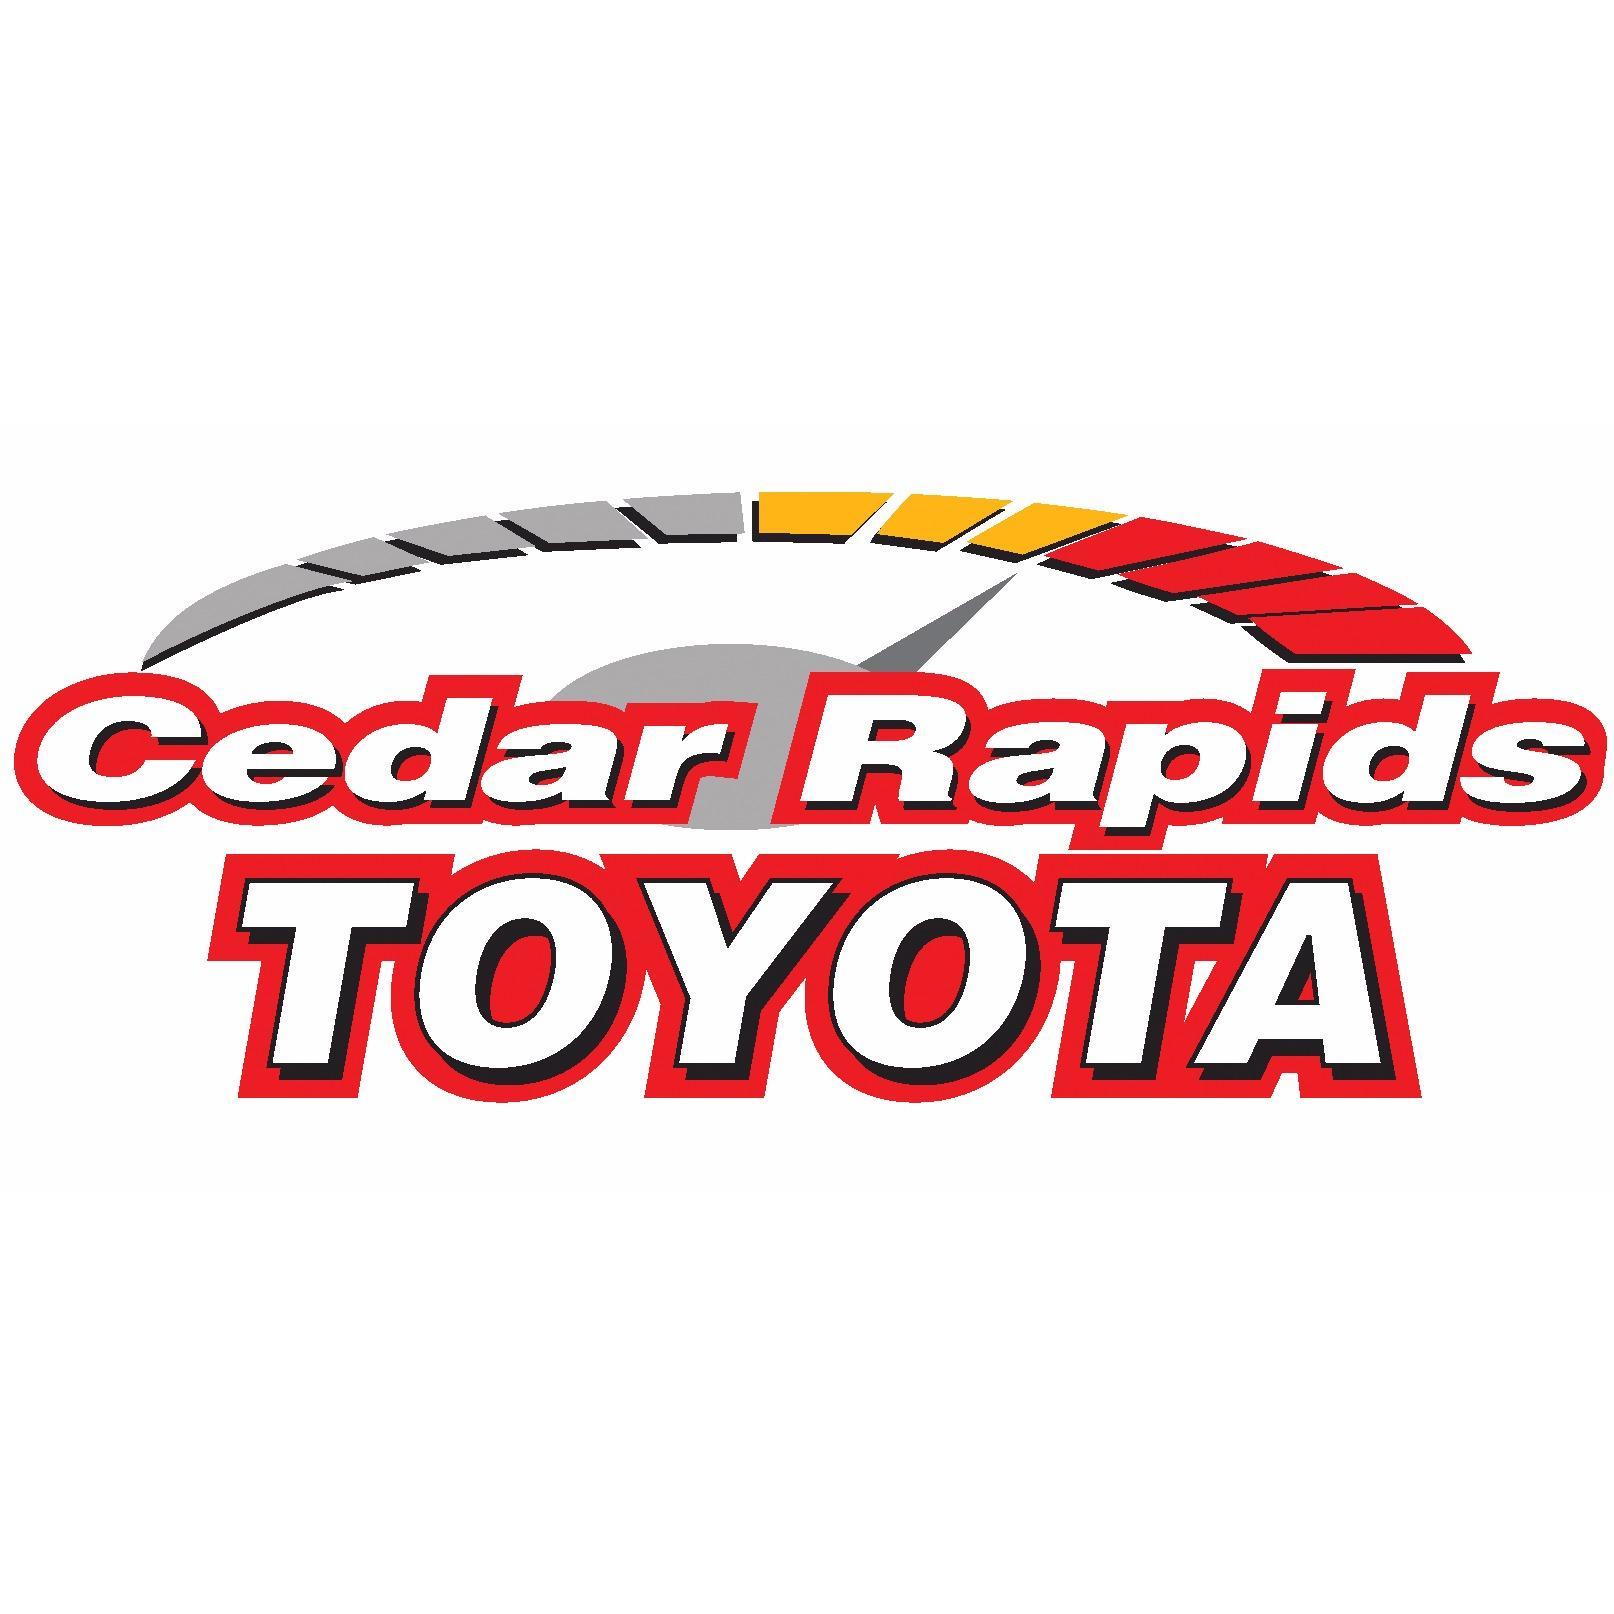 Toyota Cedar Rapids >> Cedar Rapids Toyota - 5 Photos - Auto Dealers - Hiawatha, IA - Reviews - Kudzu.com